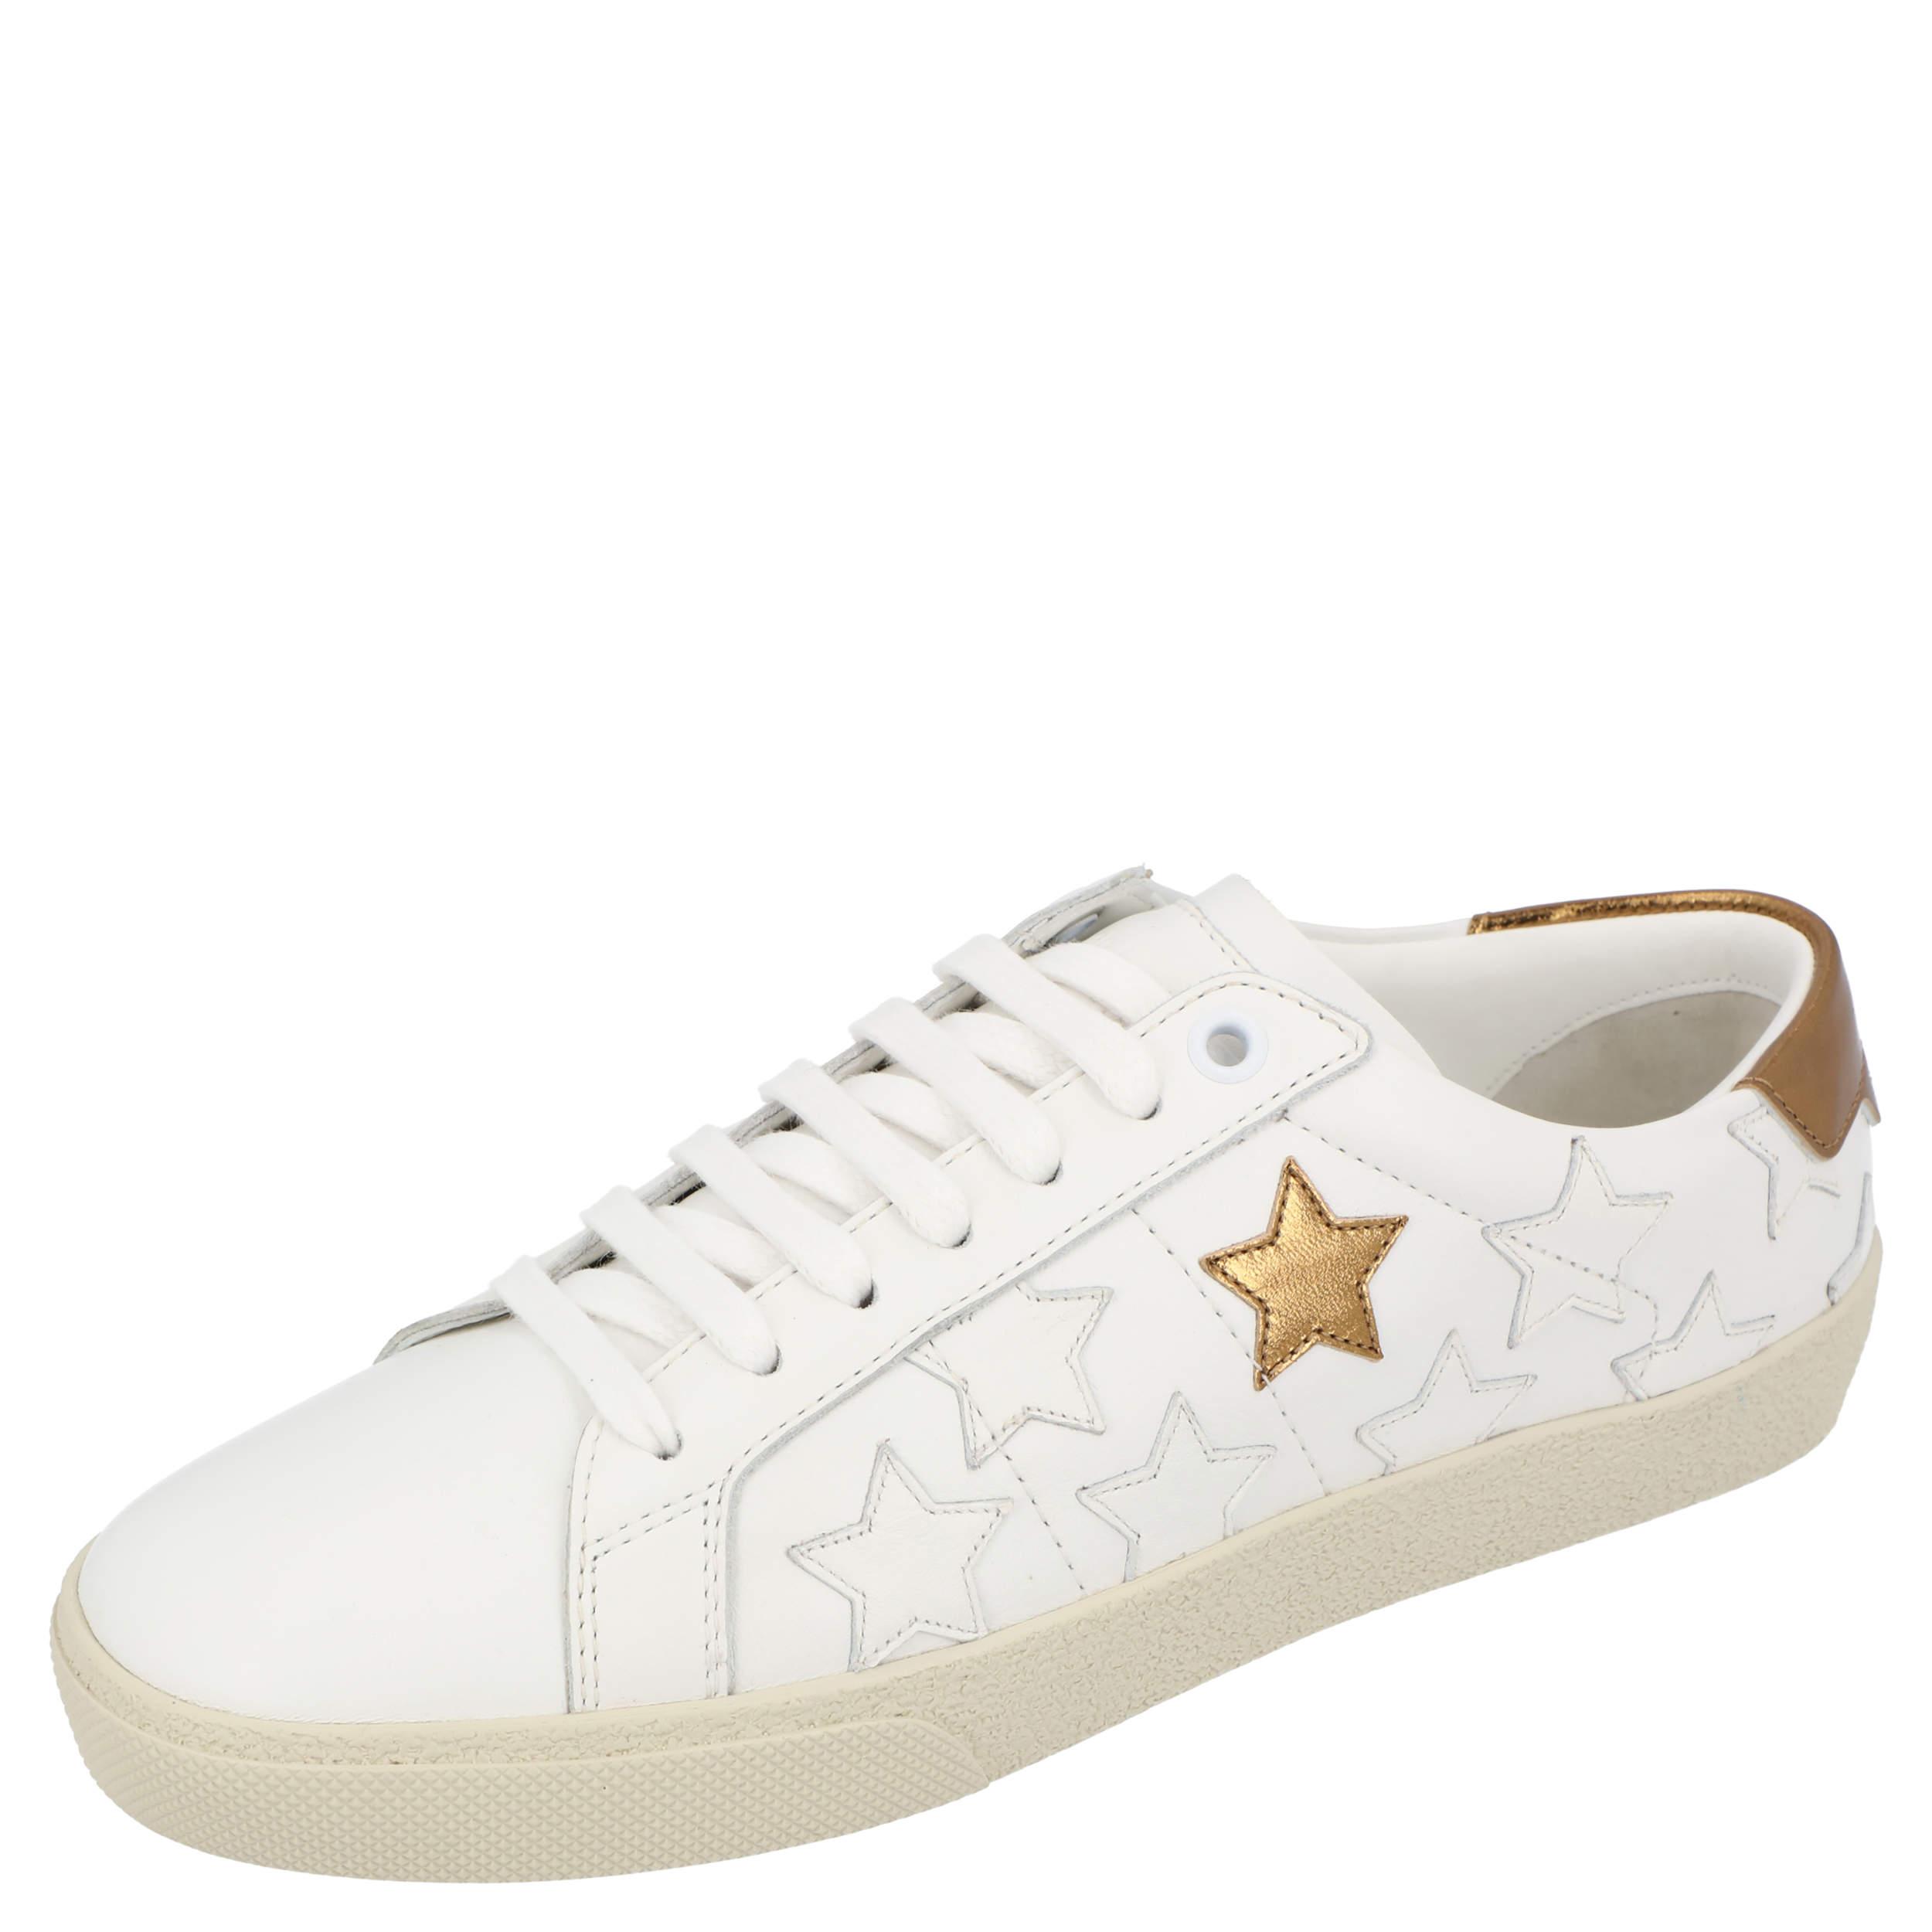 Saint Laurent White/Metallic Brown Star Court Classic Calfornia Sneakers Size EU 38